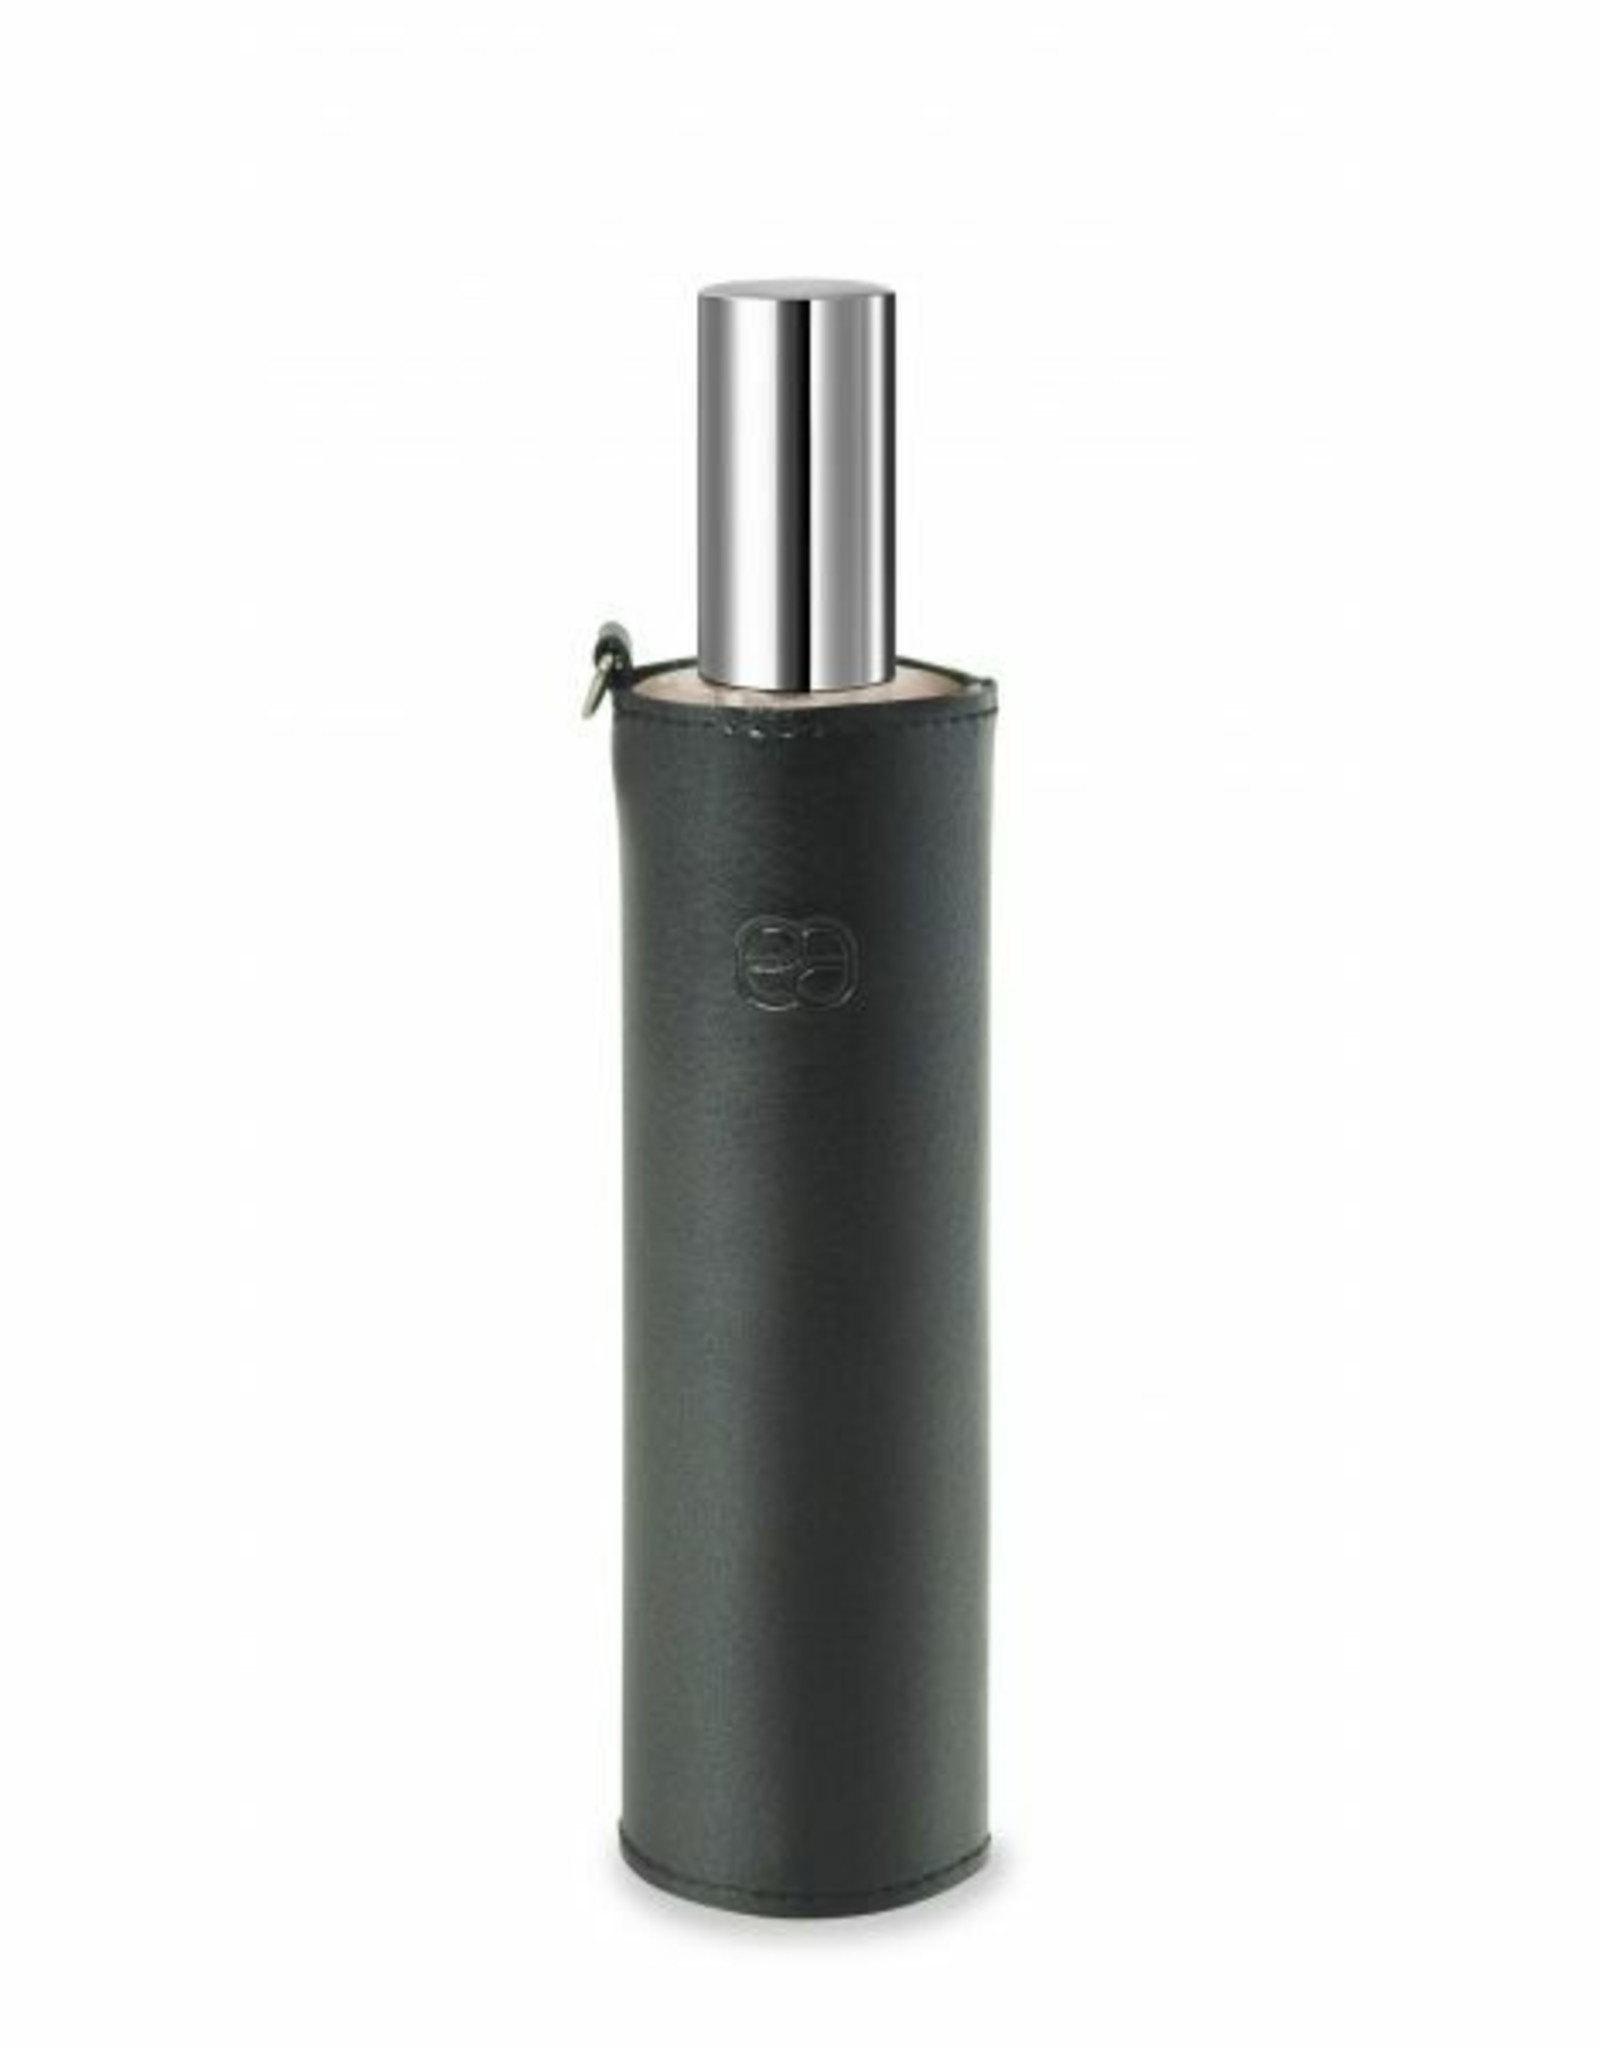 Equivalenza  Black Decorative Sleeve for Bottle